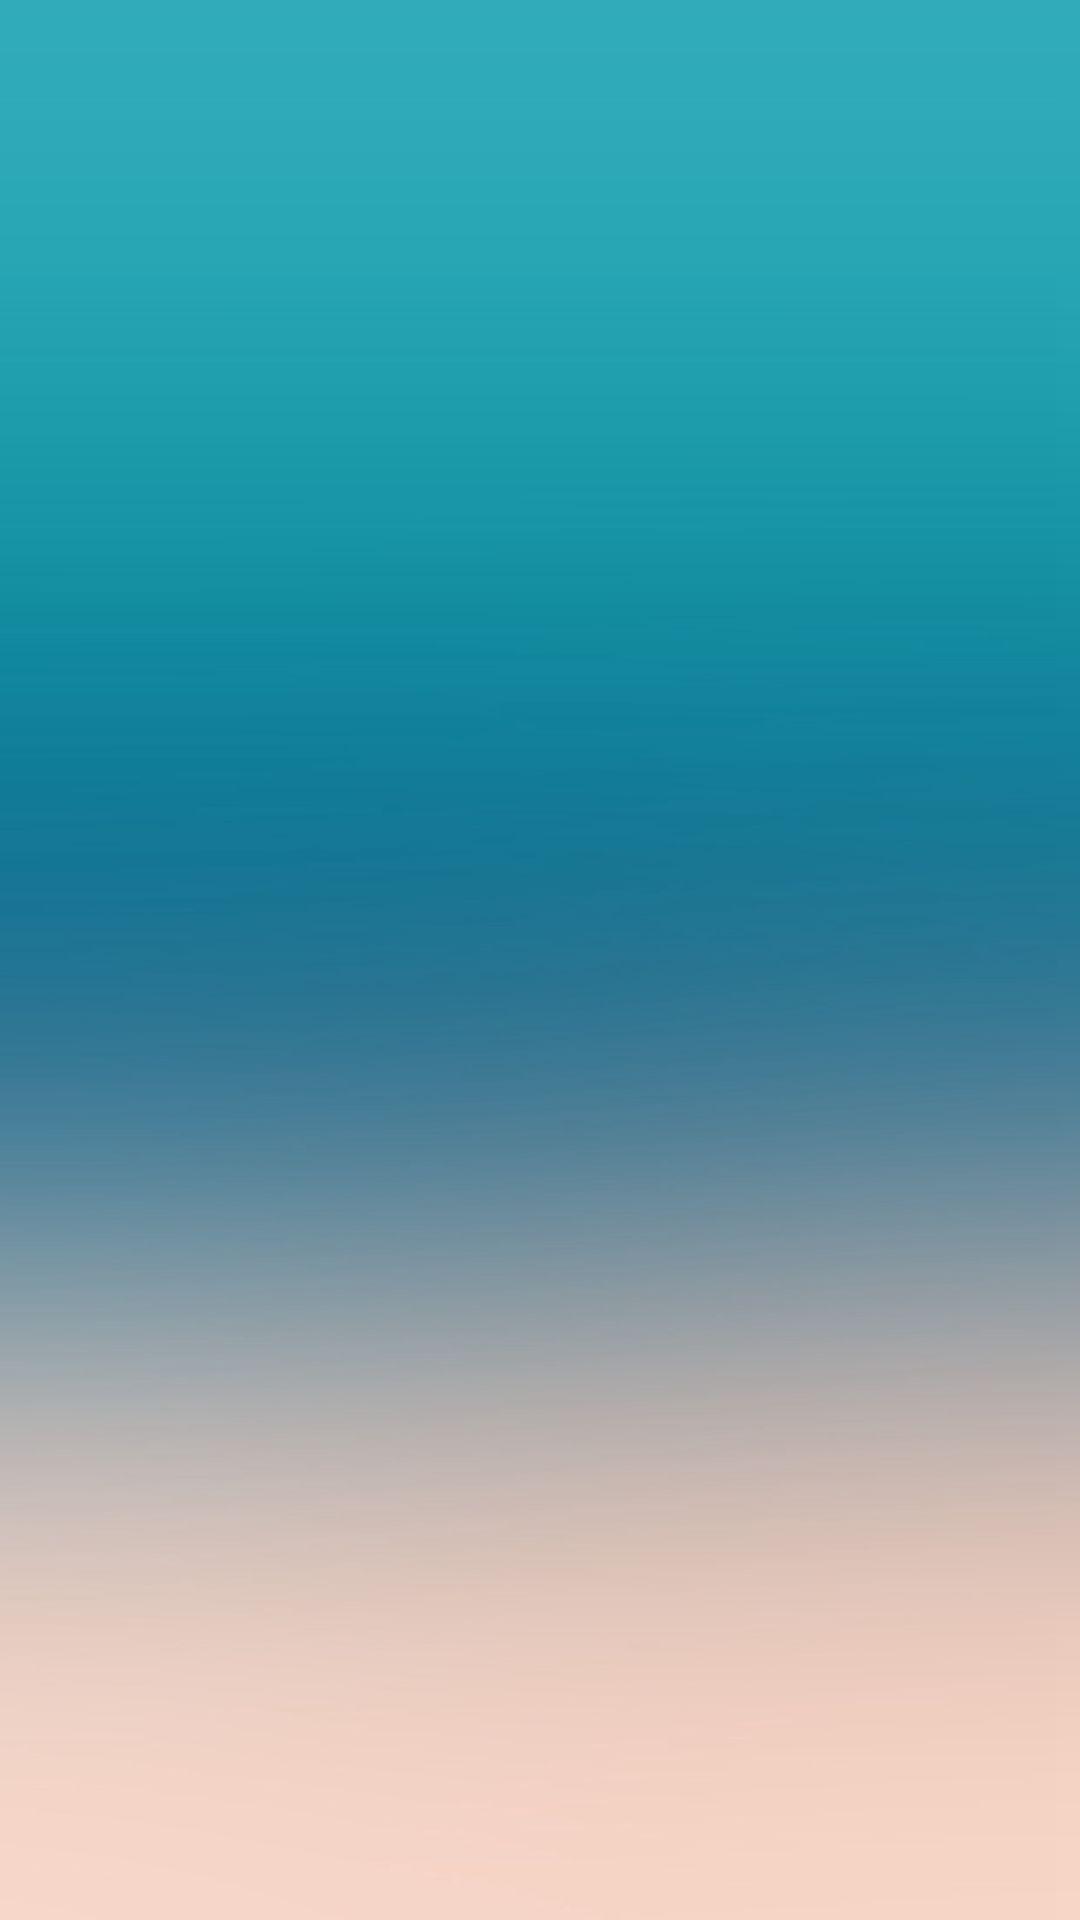 Blue Top Soft Pastel Blur Iphone 6 Plus Wallpaper Iphone 6 8